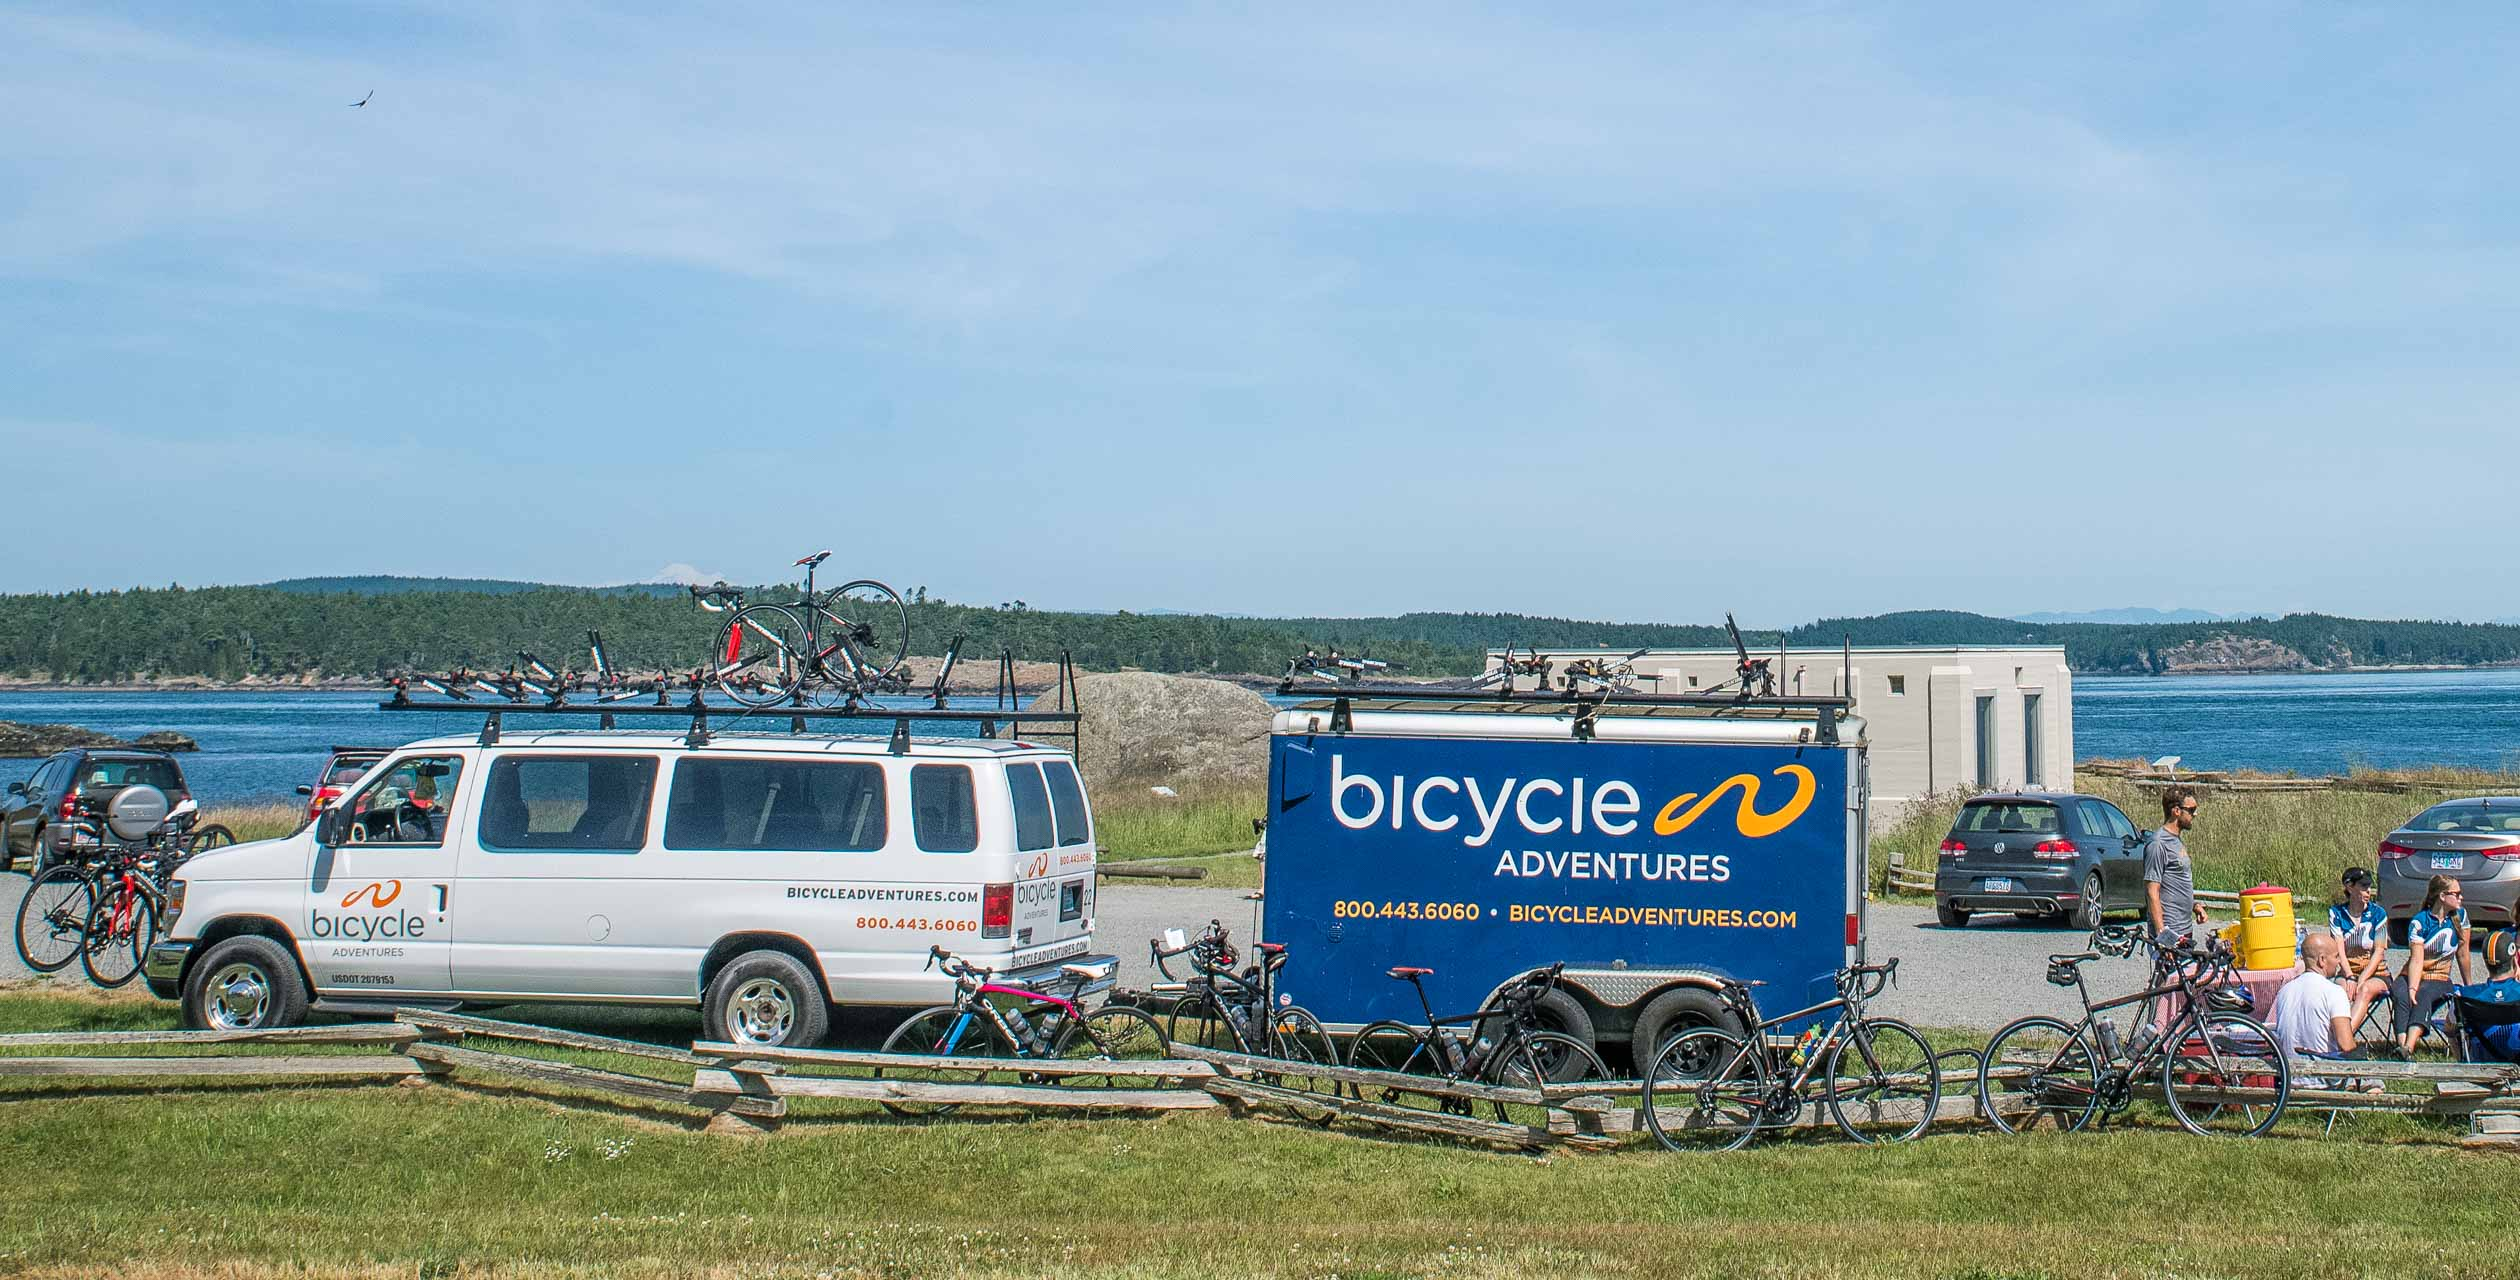 Bicycle Adventures van with bikes and trailer